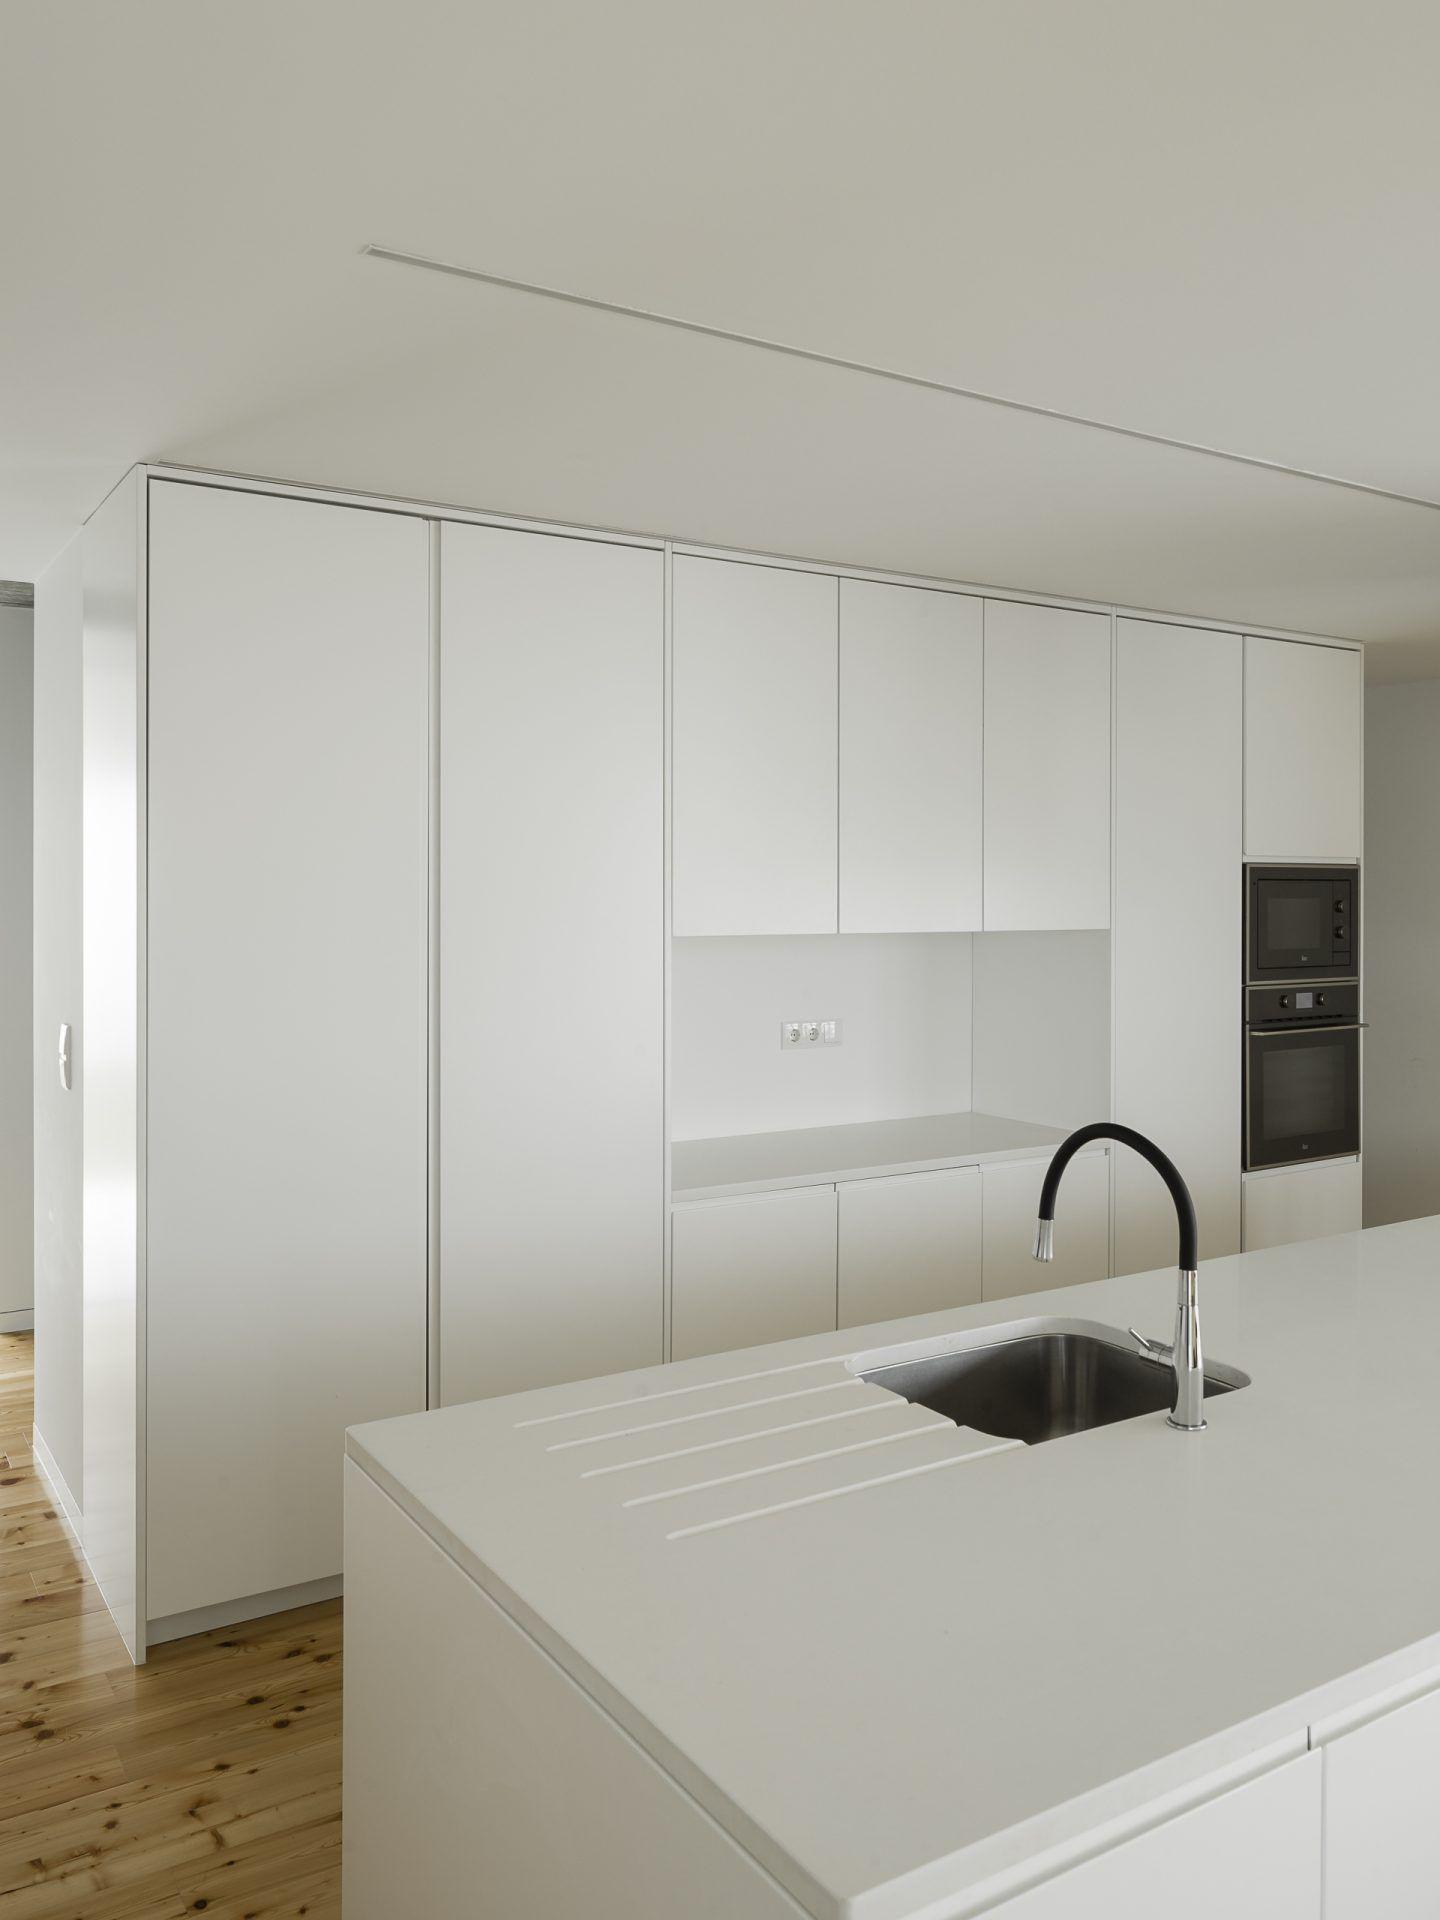 IGNANT-Architecture-BDArquitectura-Gloma-House-09